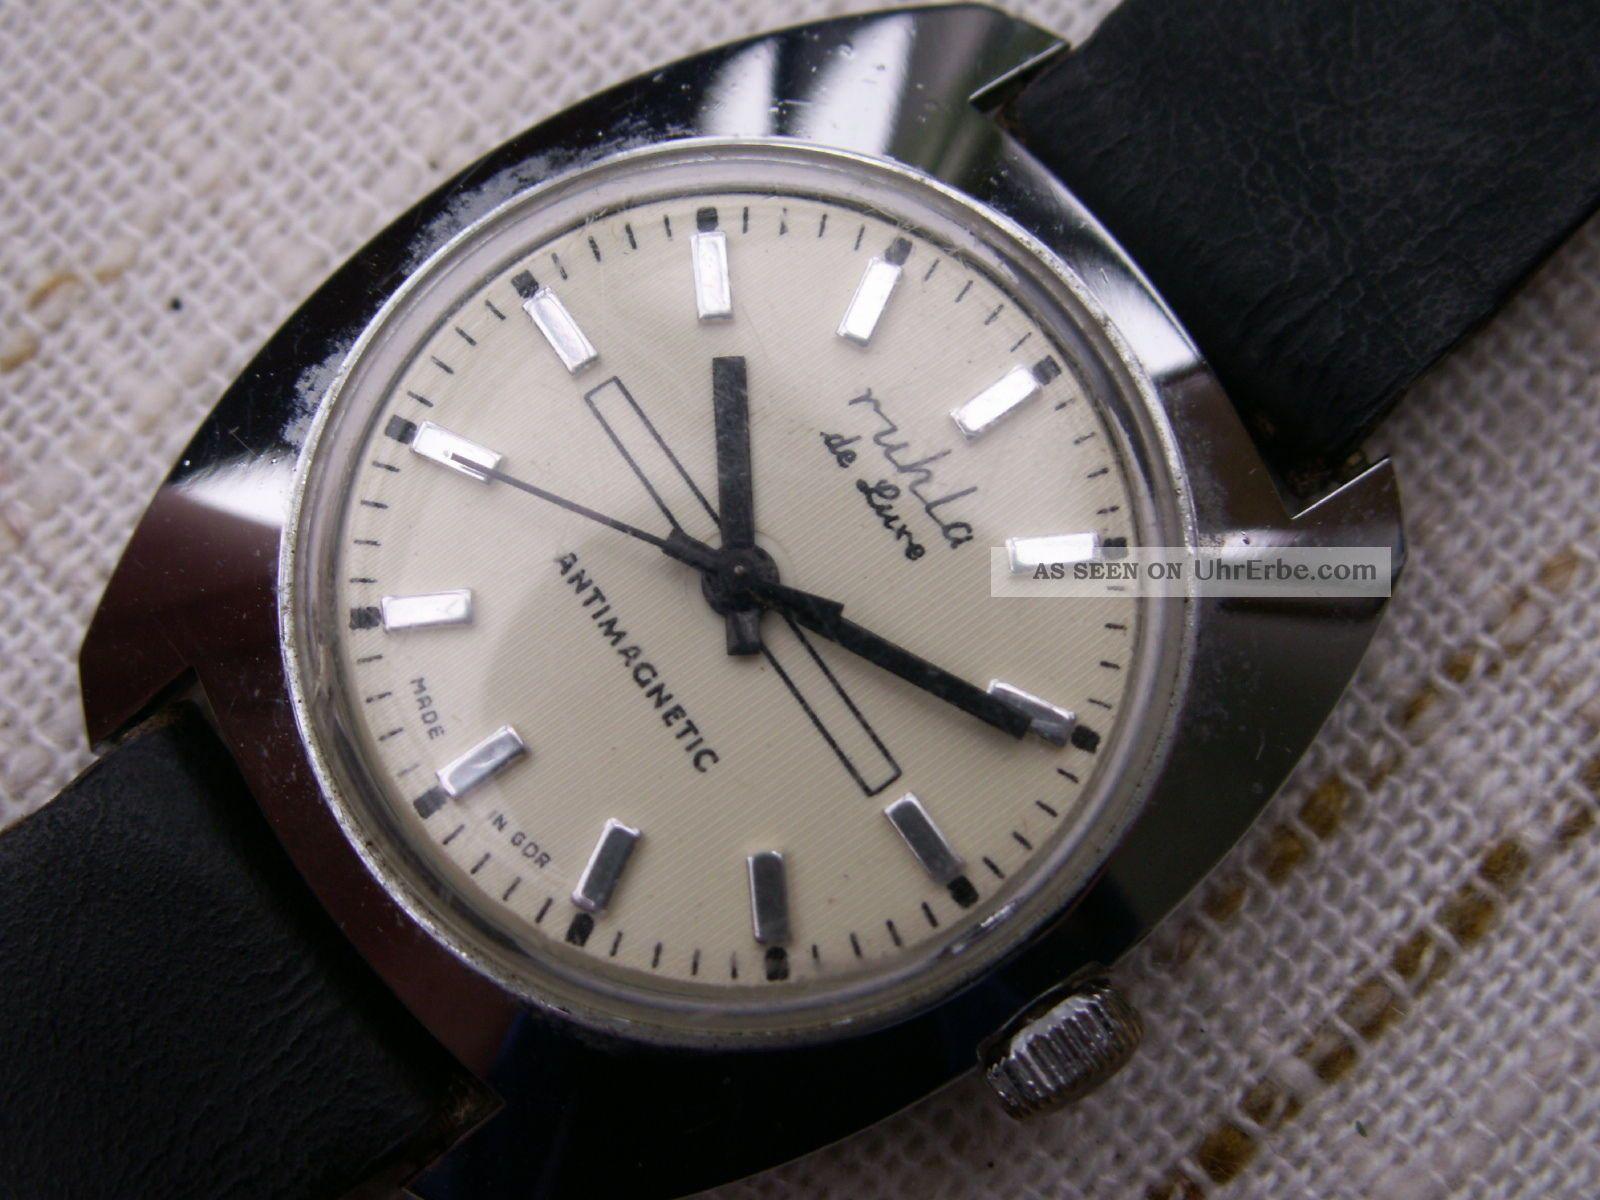 Ddr Herren - Uhr Ruhla De Luxe,  Seltenes Disign,  Läuft,  Sammler,  Kenner, Armbanduhren Bild